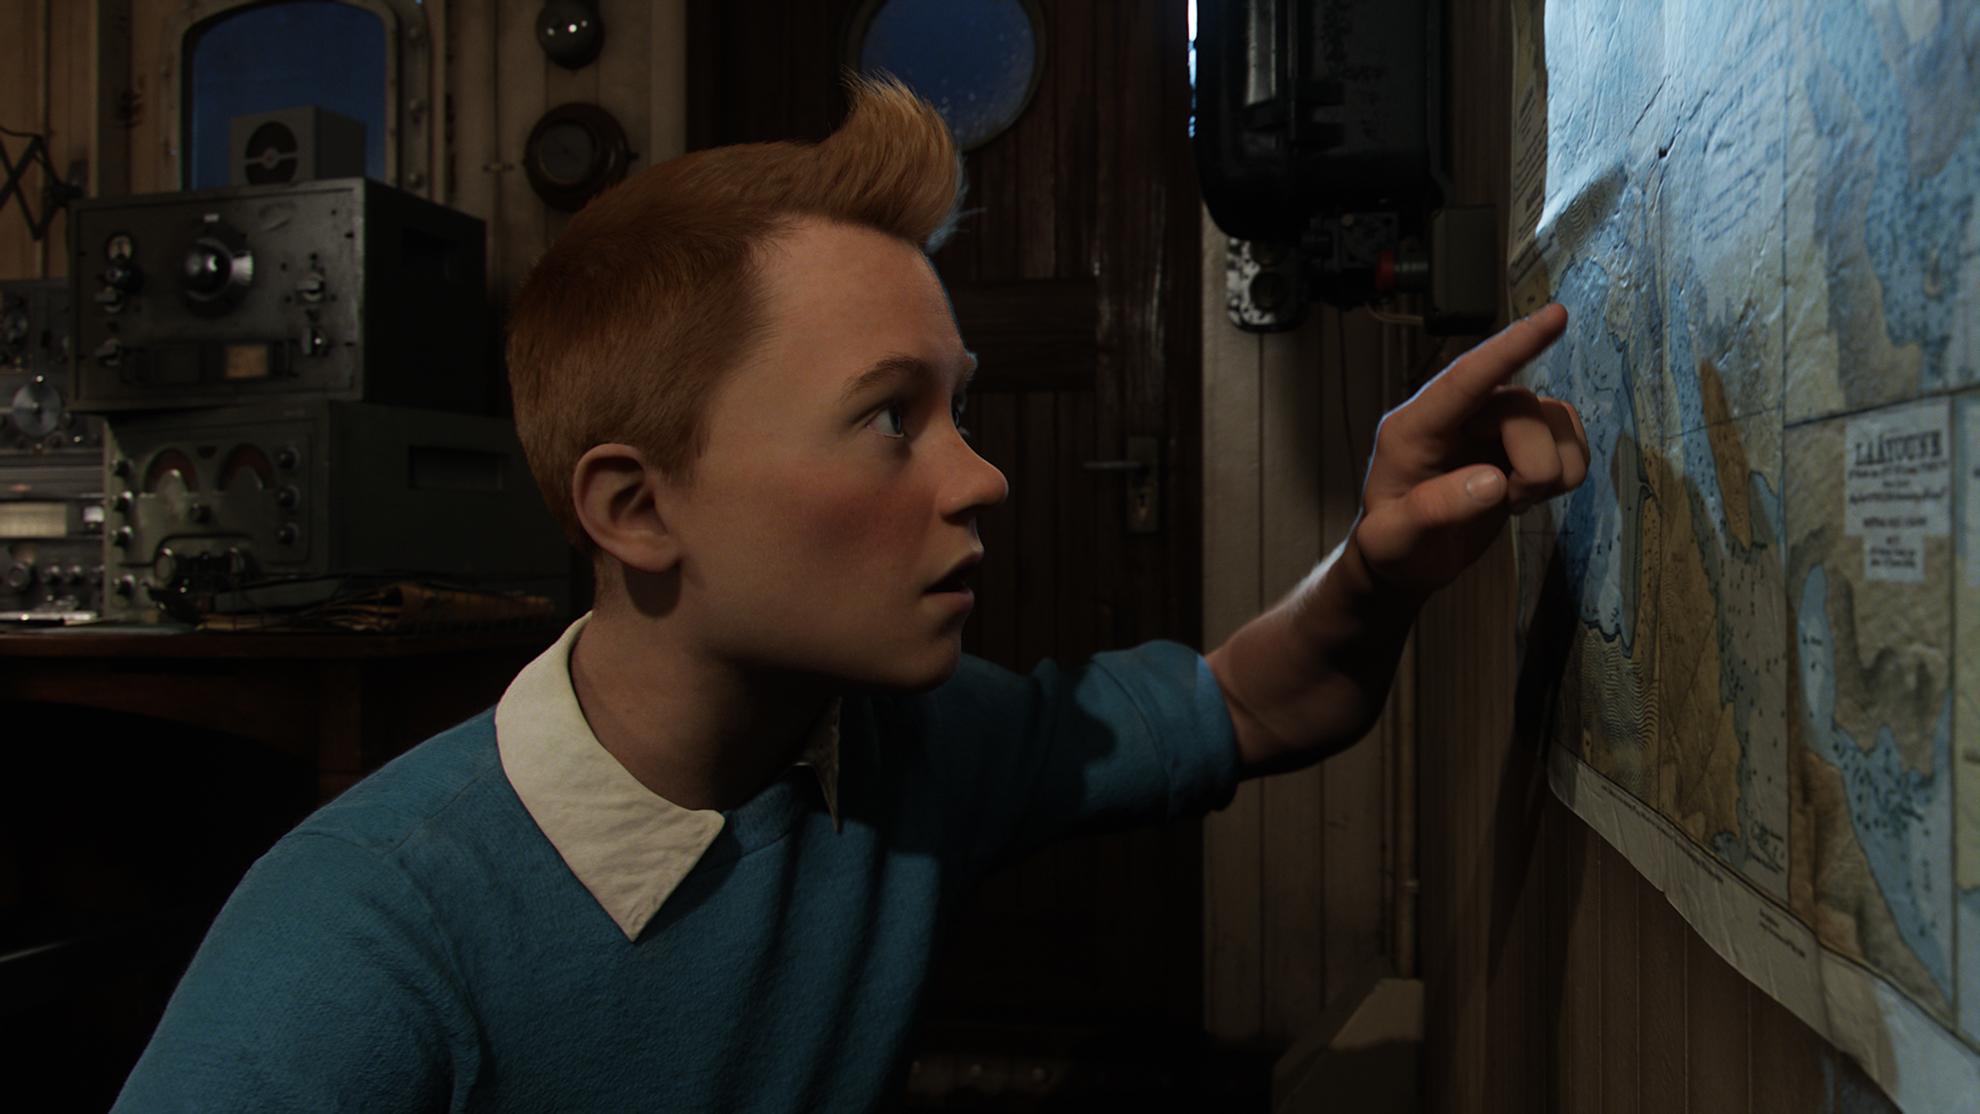 Tintin: ESTP – The Book Addict's Guide to MBTI: